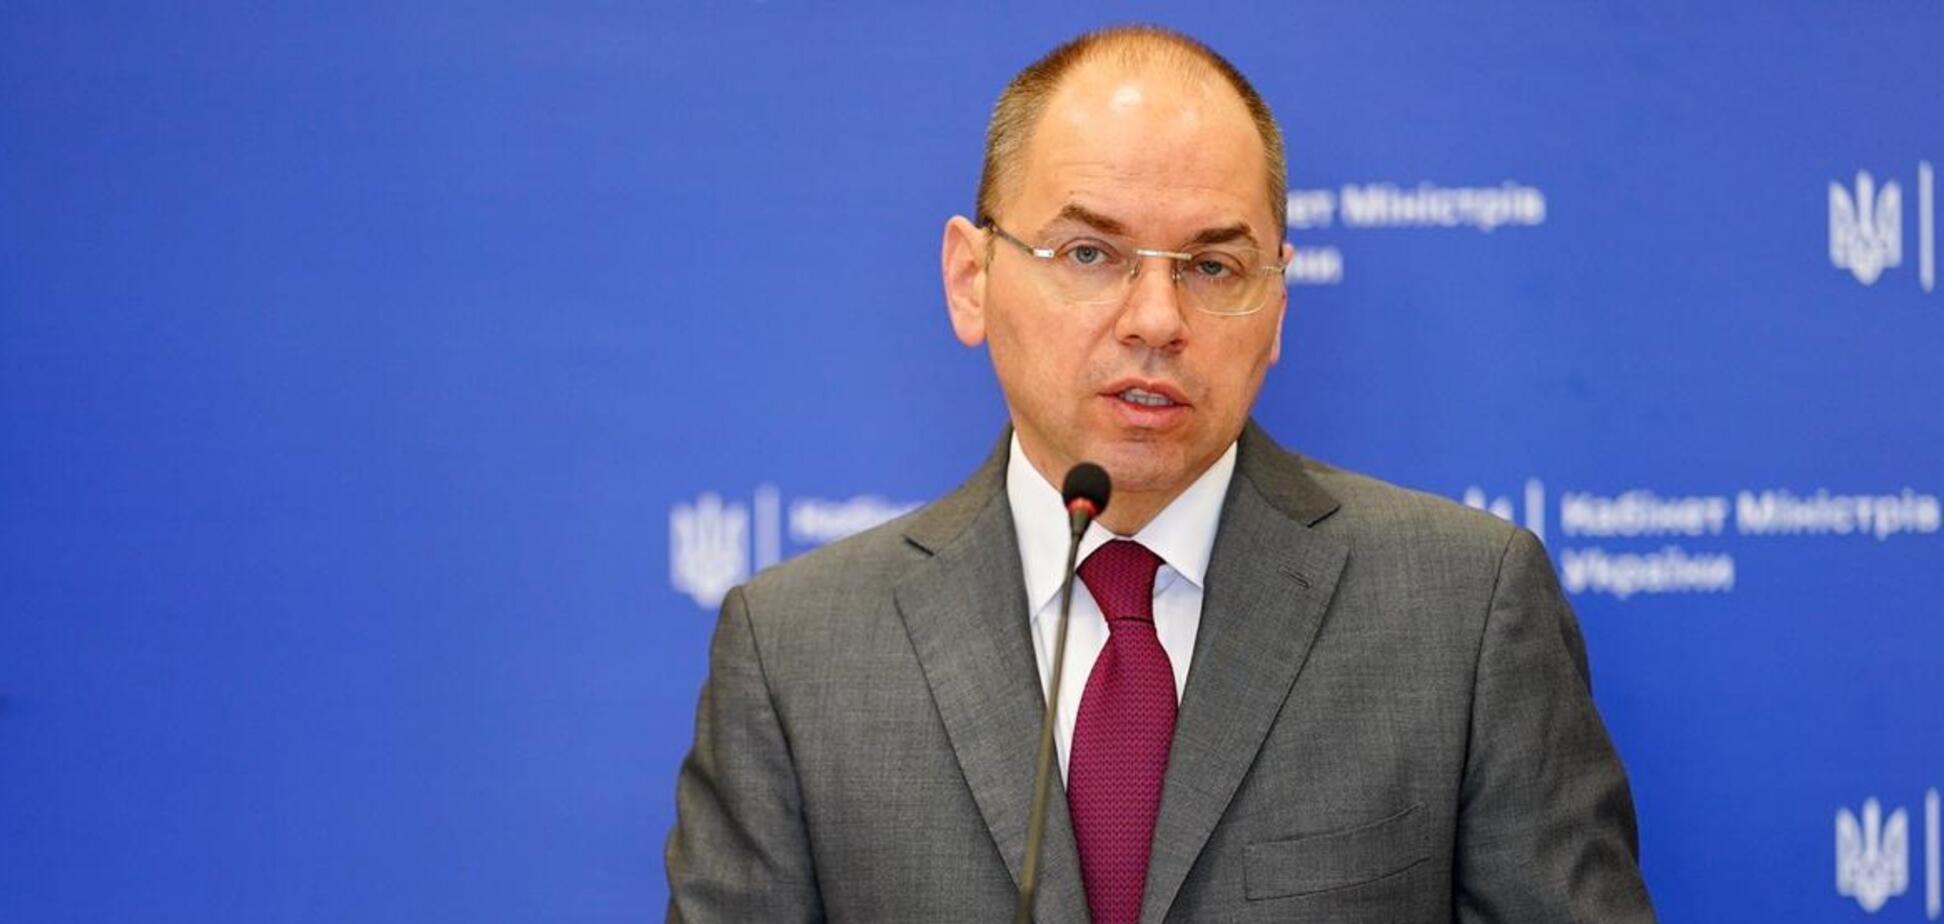 Степанов: про жодне скасування локдауну в Україні не йдеться